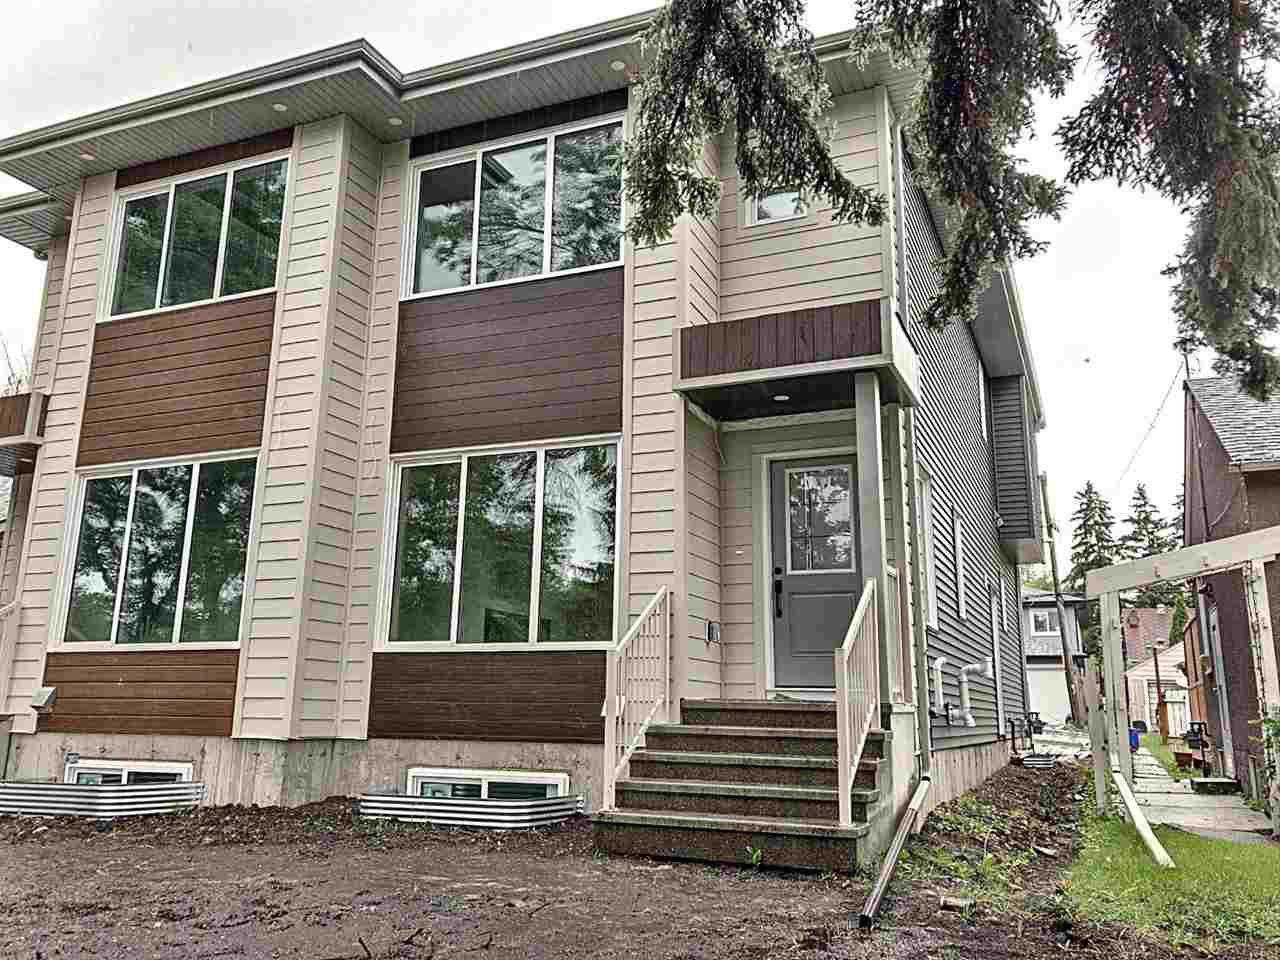 Main Photo: 8145 79 Avenue in Edmonton: Zone 17 House for sale : MLS®# E4204641